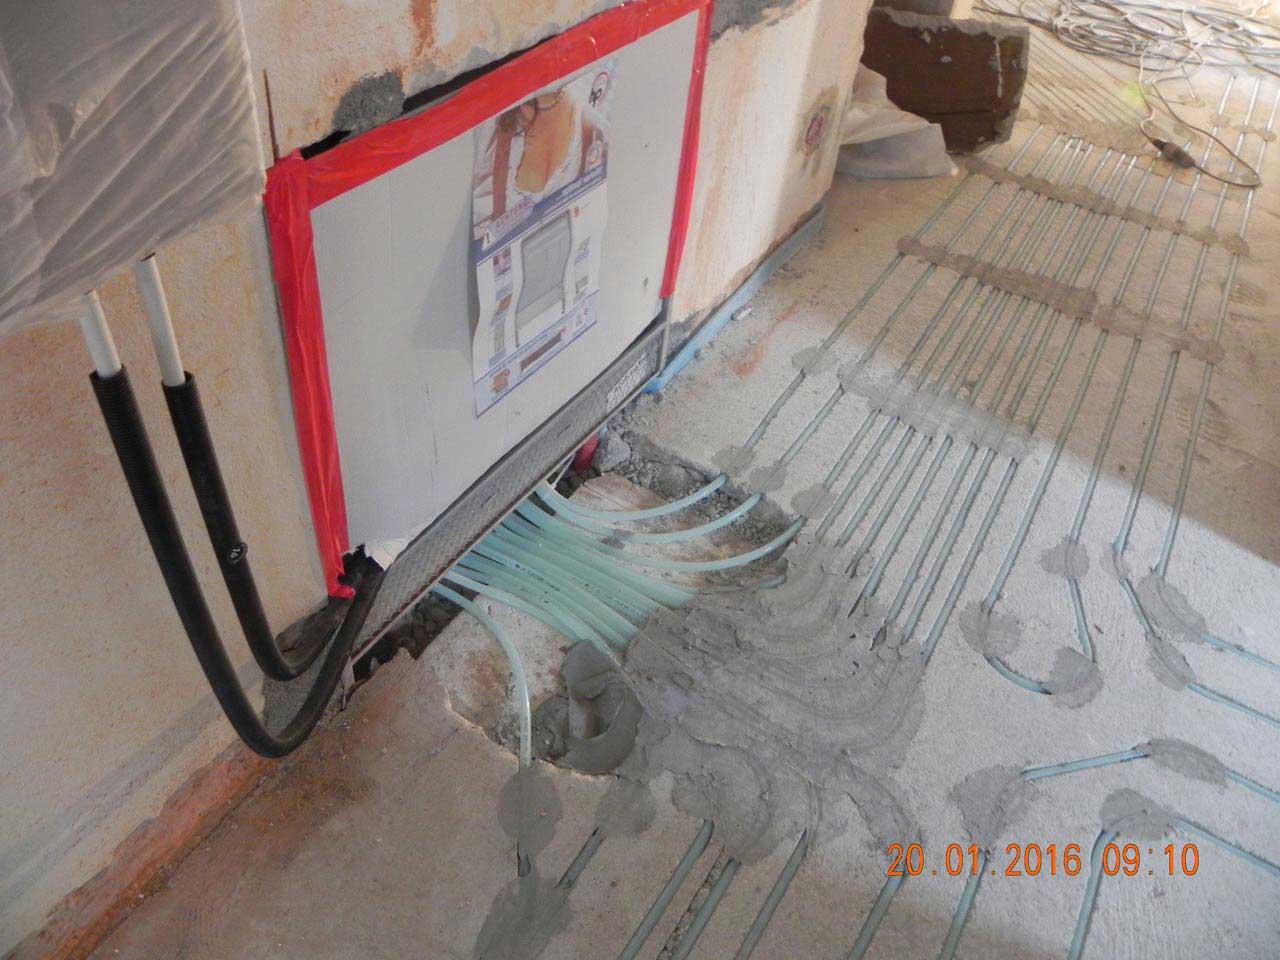 Fußbodenheizung - Verteiler